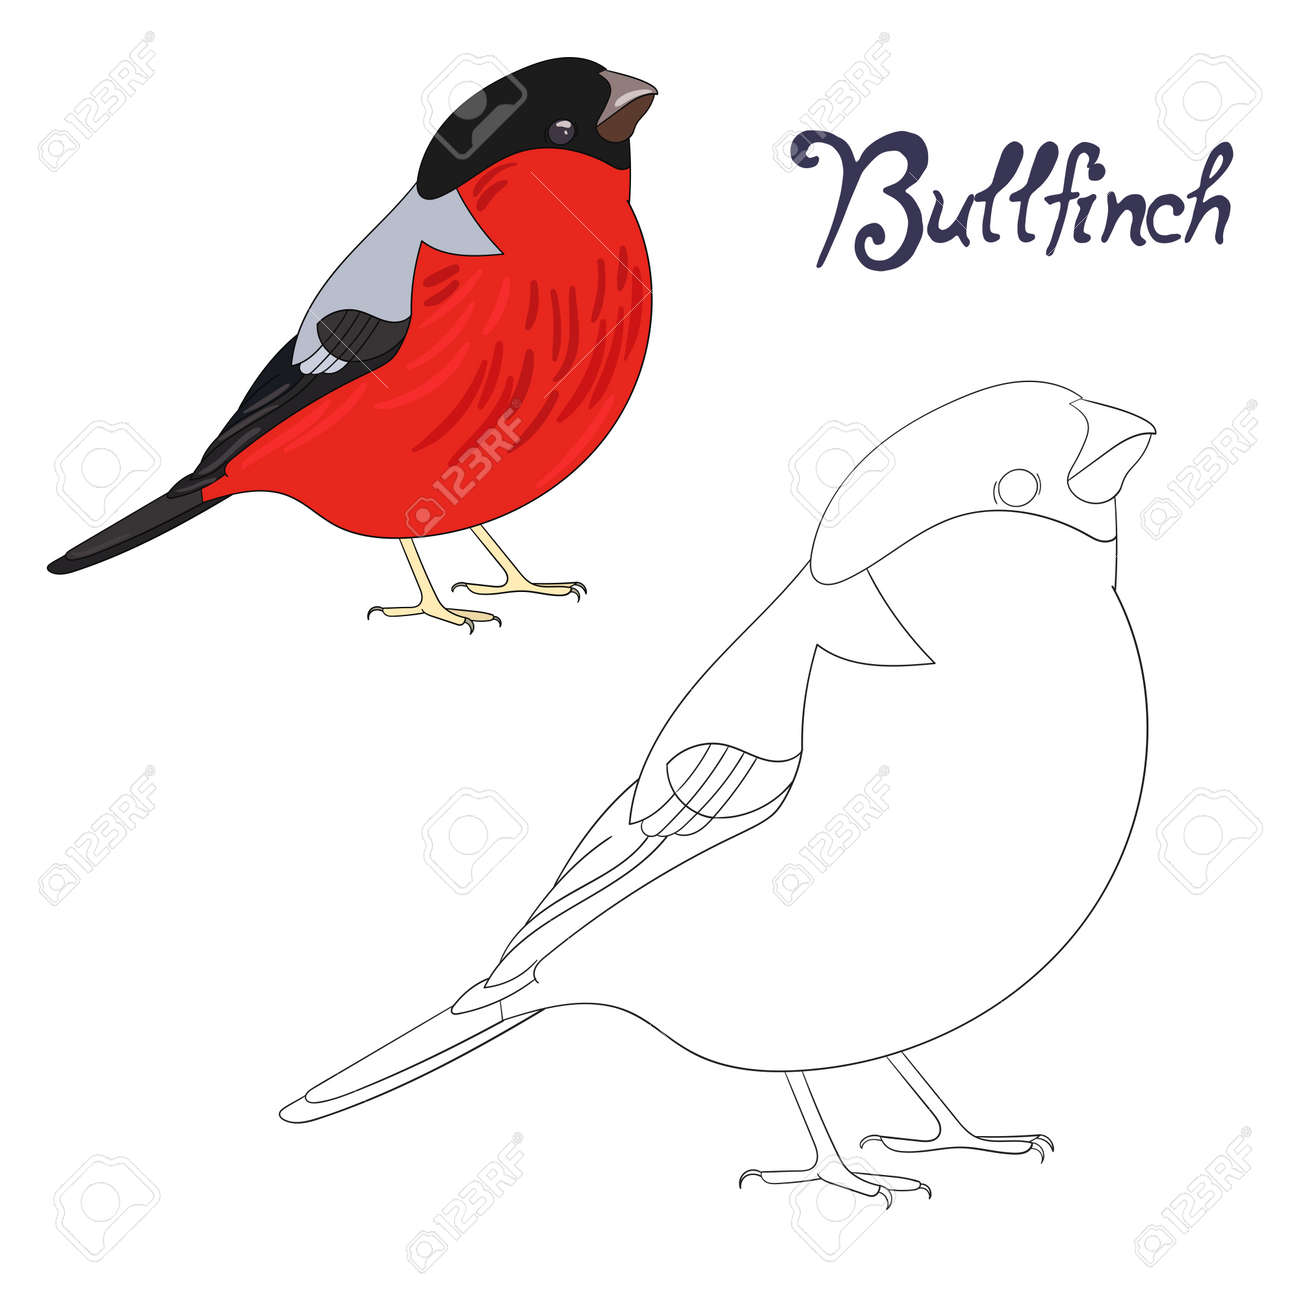 Educational Game Coloring Book Bullfinch Bird Cartoon Doodle Hand Drawn Vector Illustration Stock